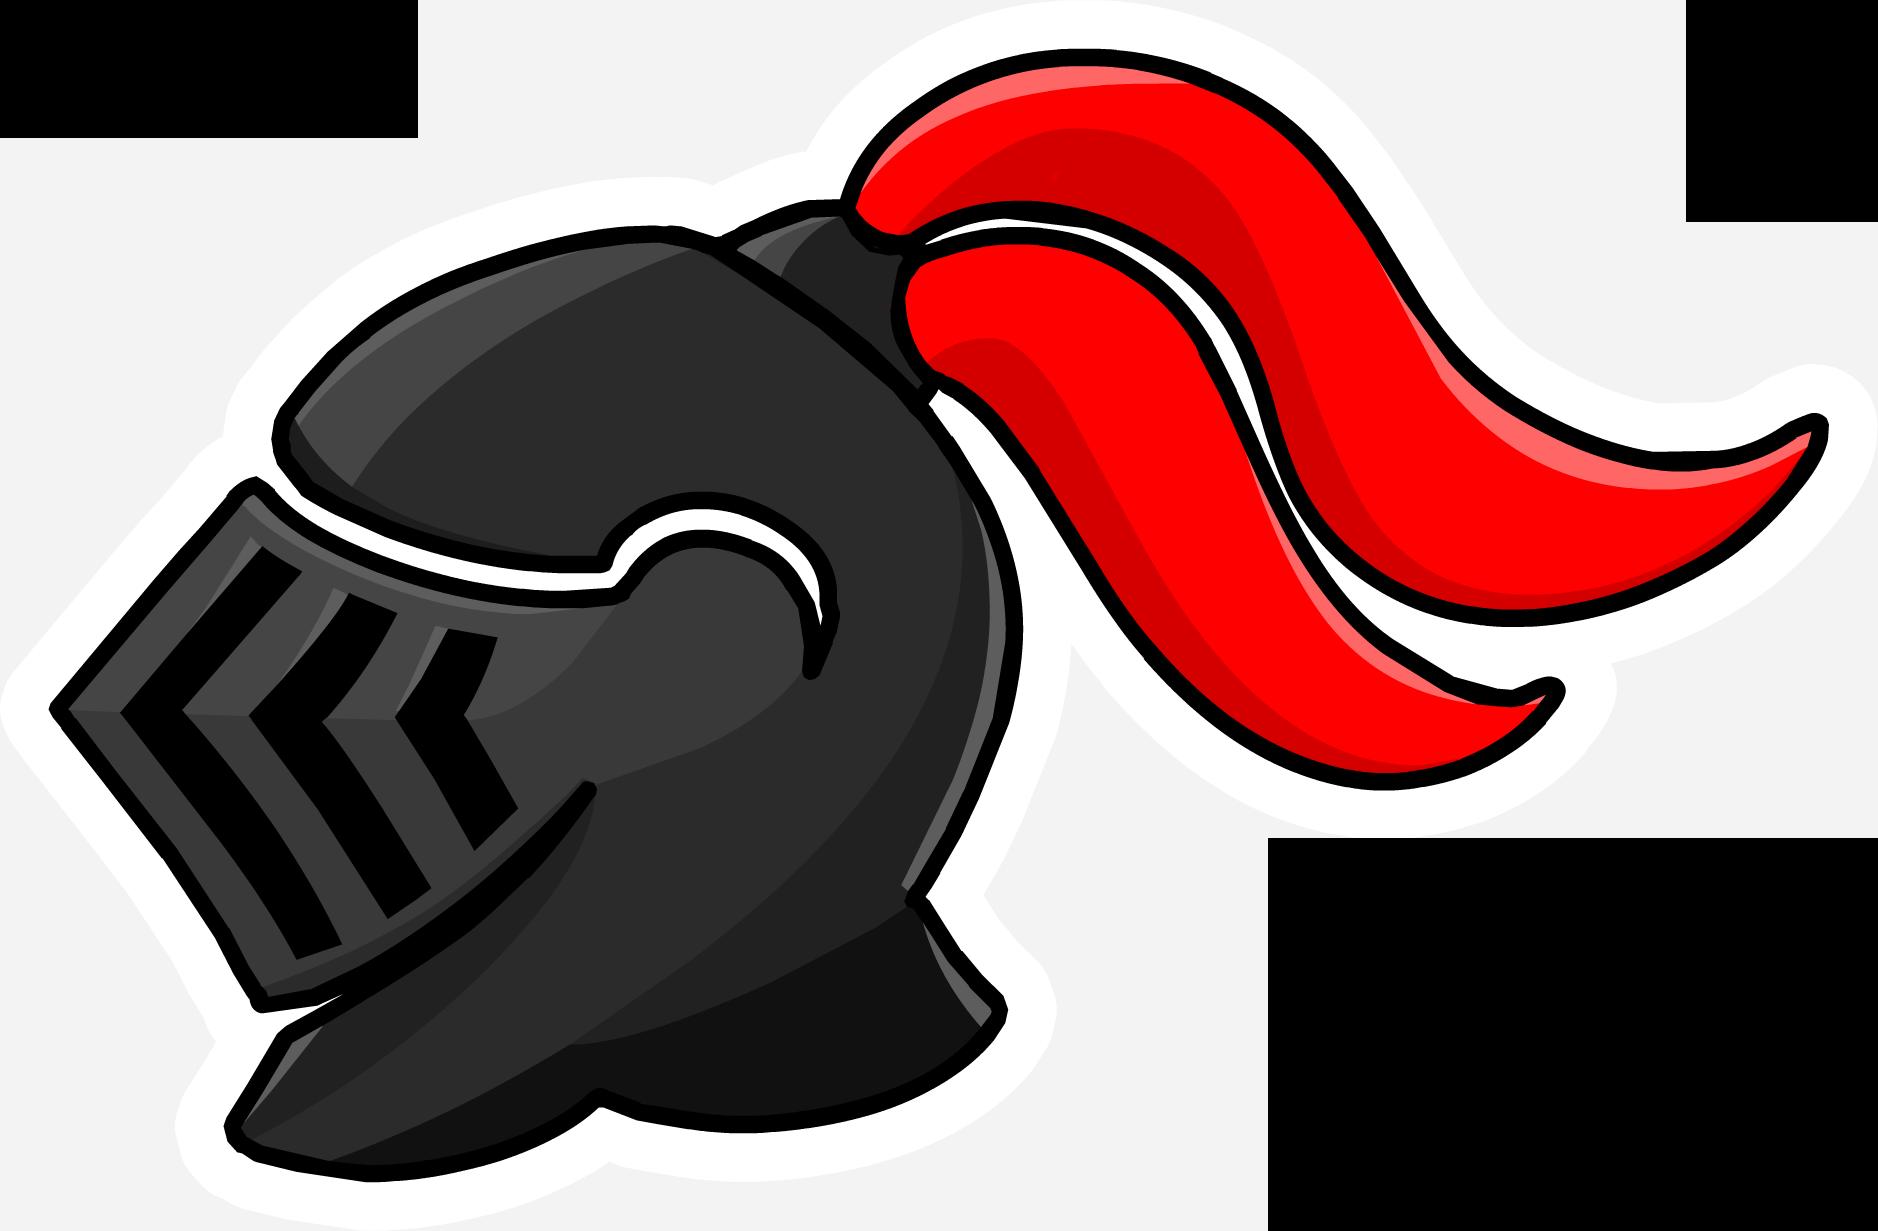 Spartan clipart knight helmet. Themes black roblox plus